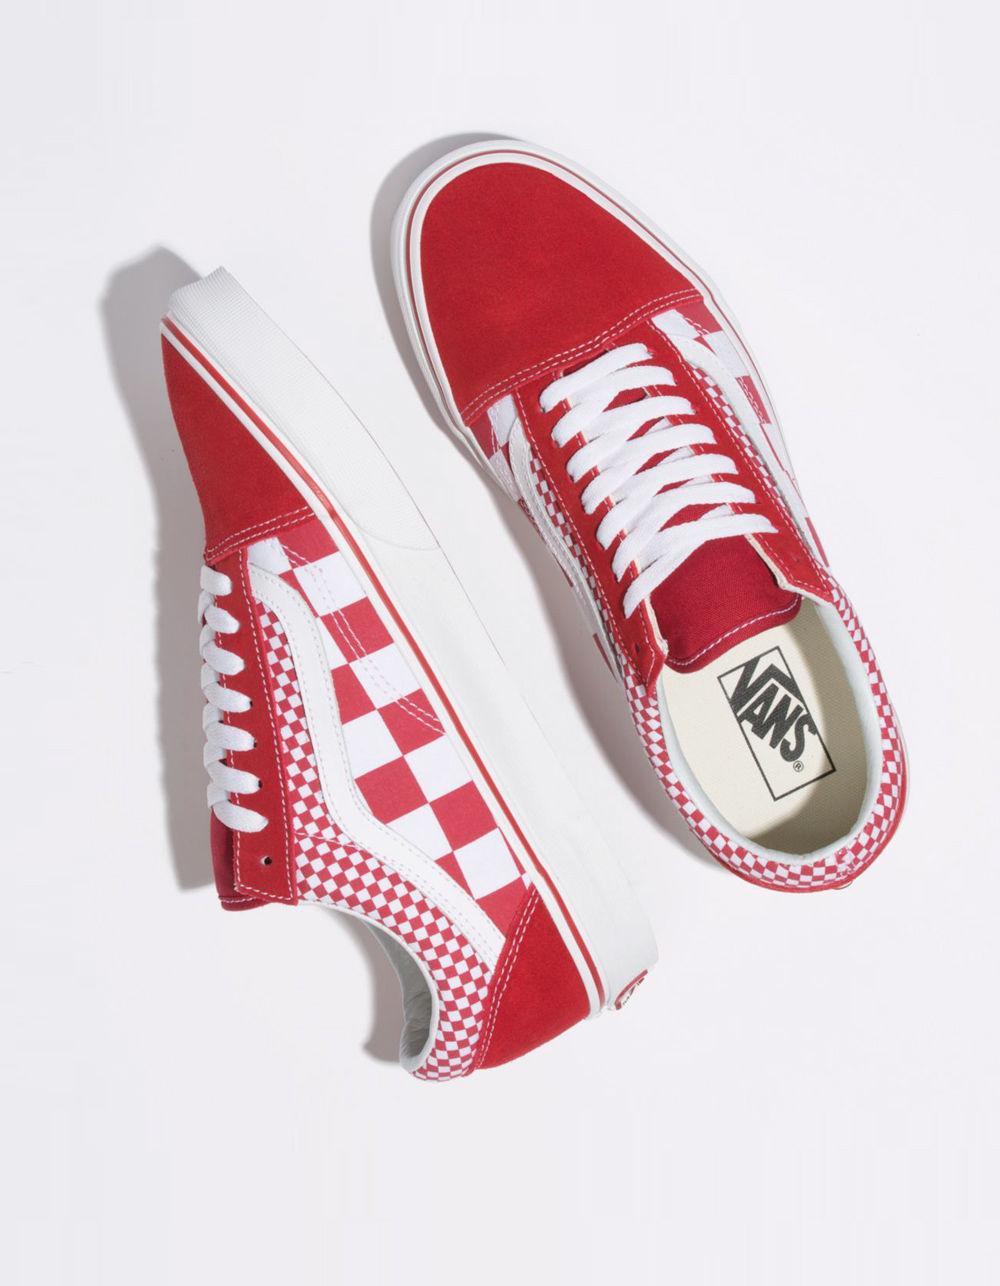 45eb96fd3a5 Vans - Red Mix Checker Old Skool Chili Pepper   True White Shoes - Lyst.  View fullscreen